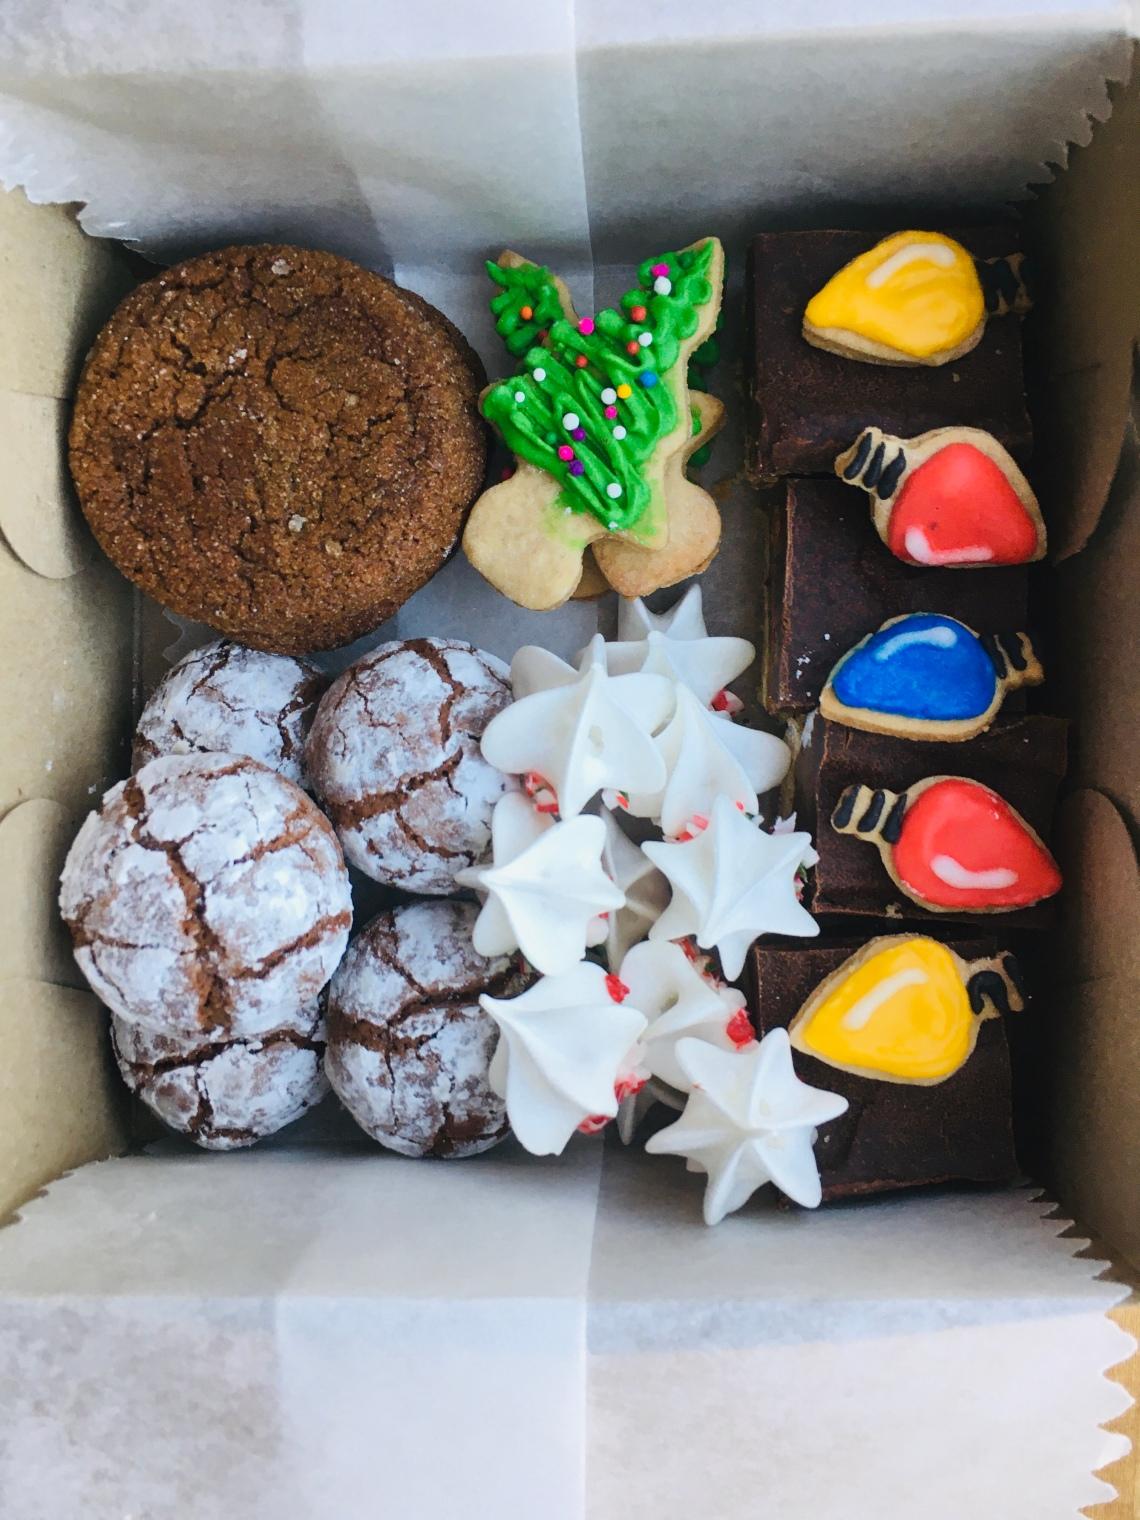 Mixed baking: small box (C)